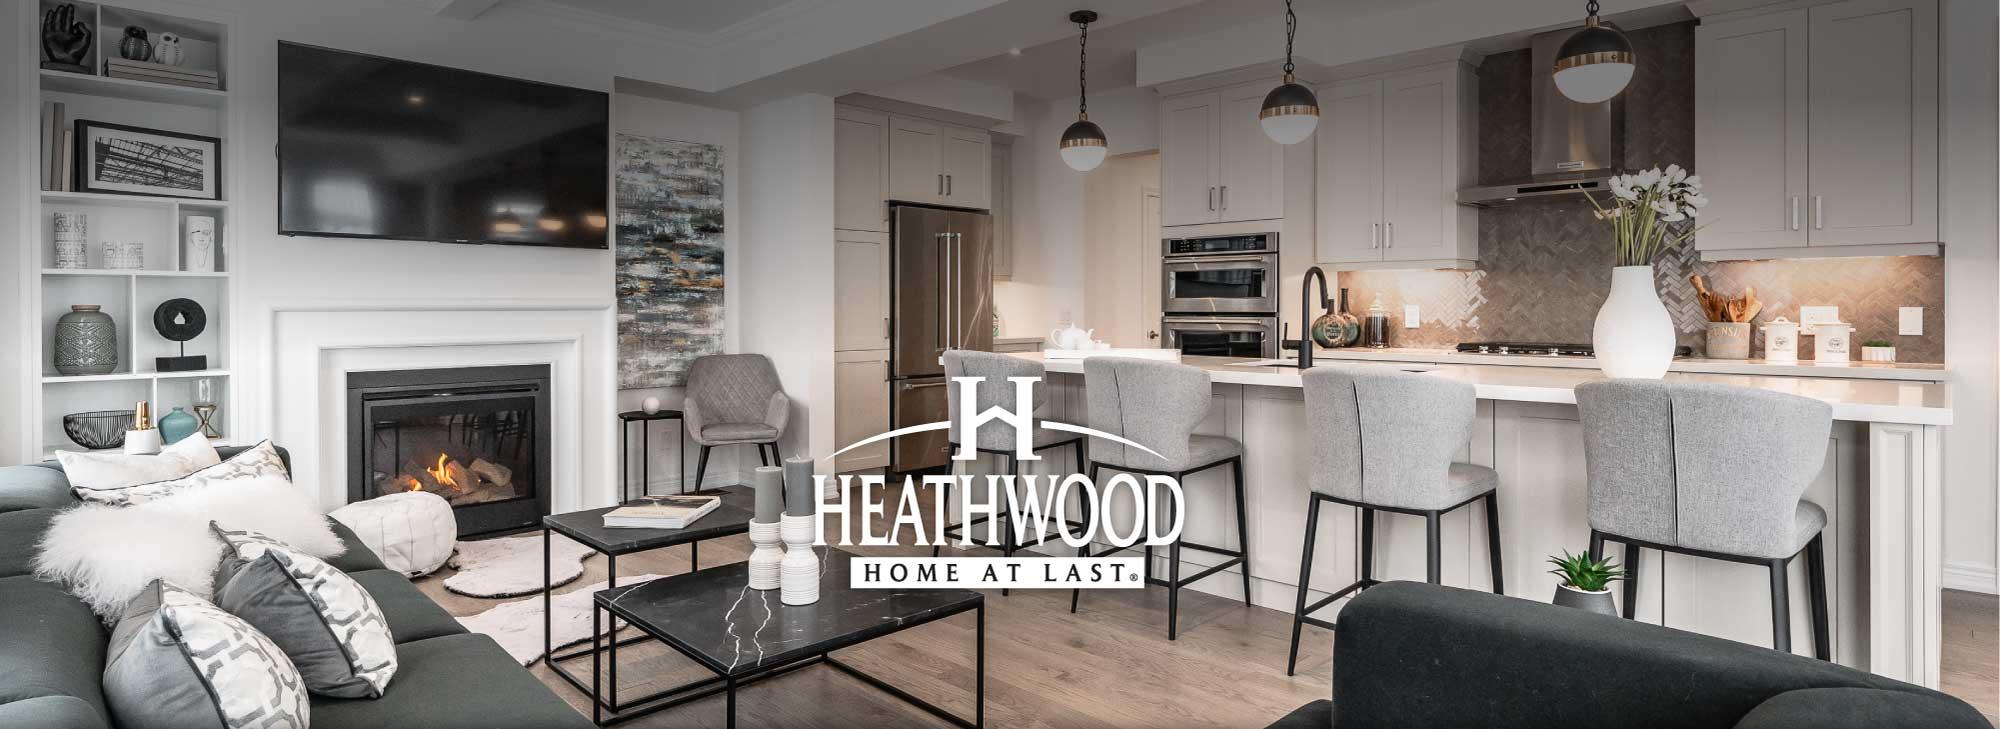 Heathwood page